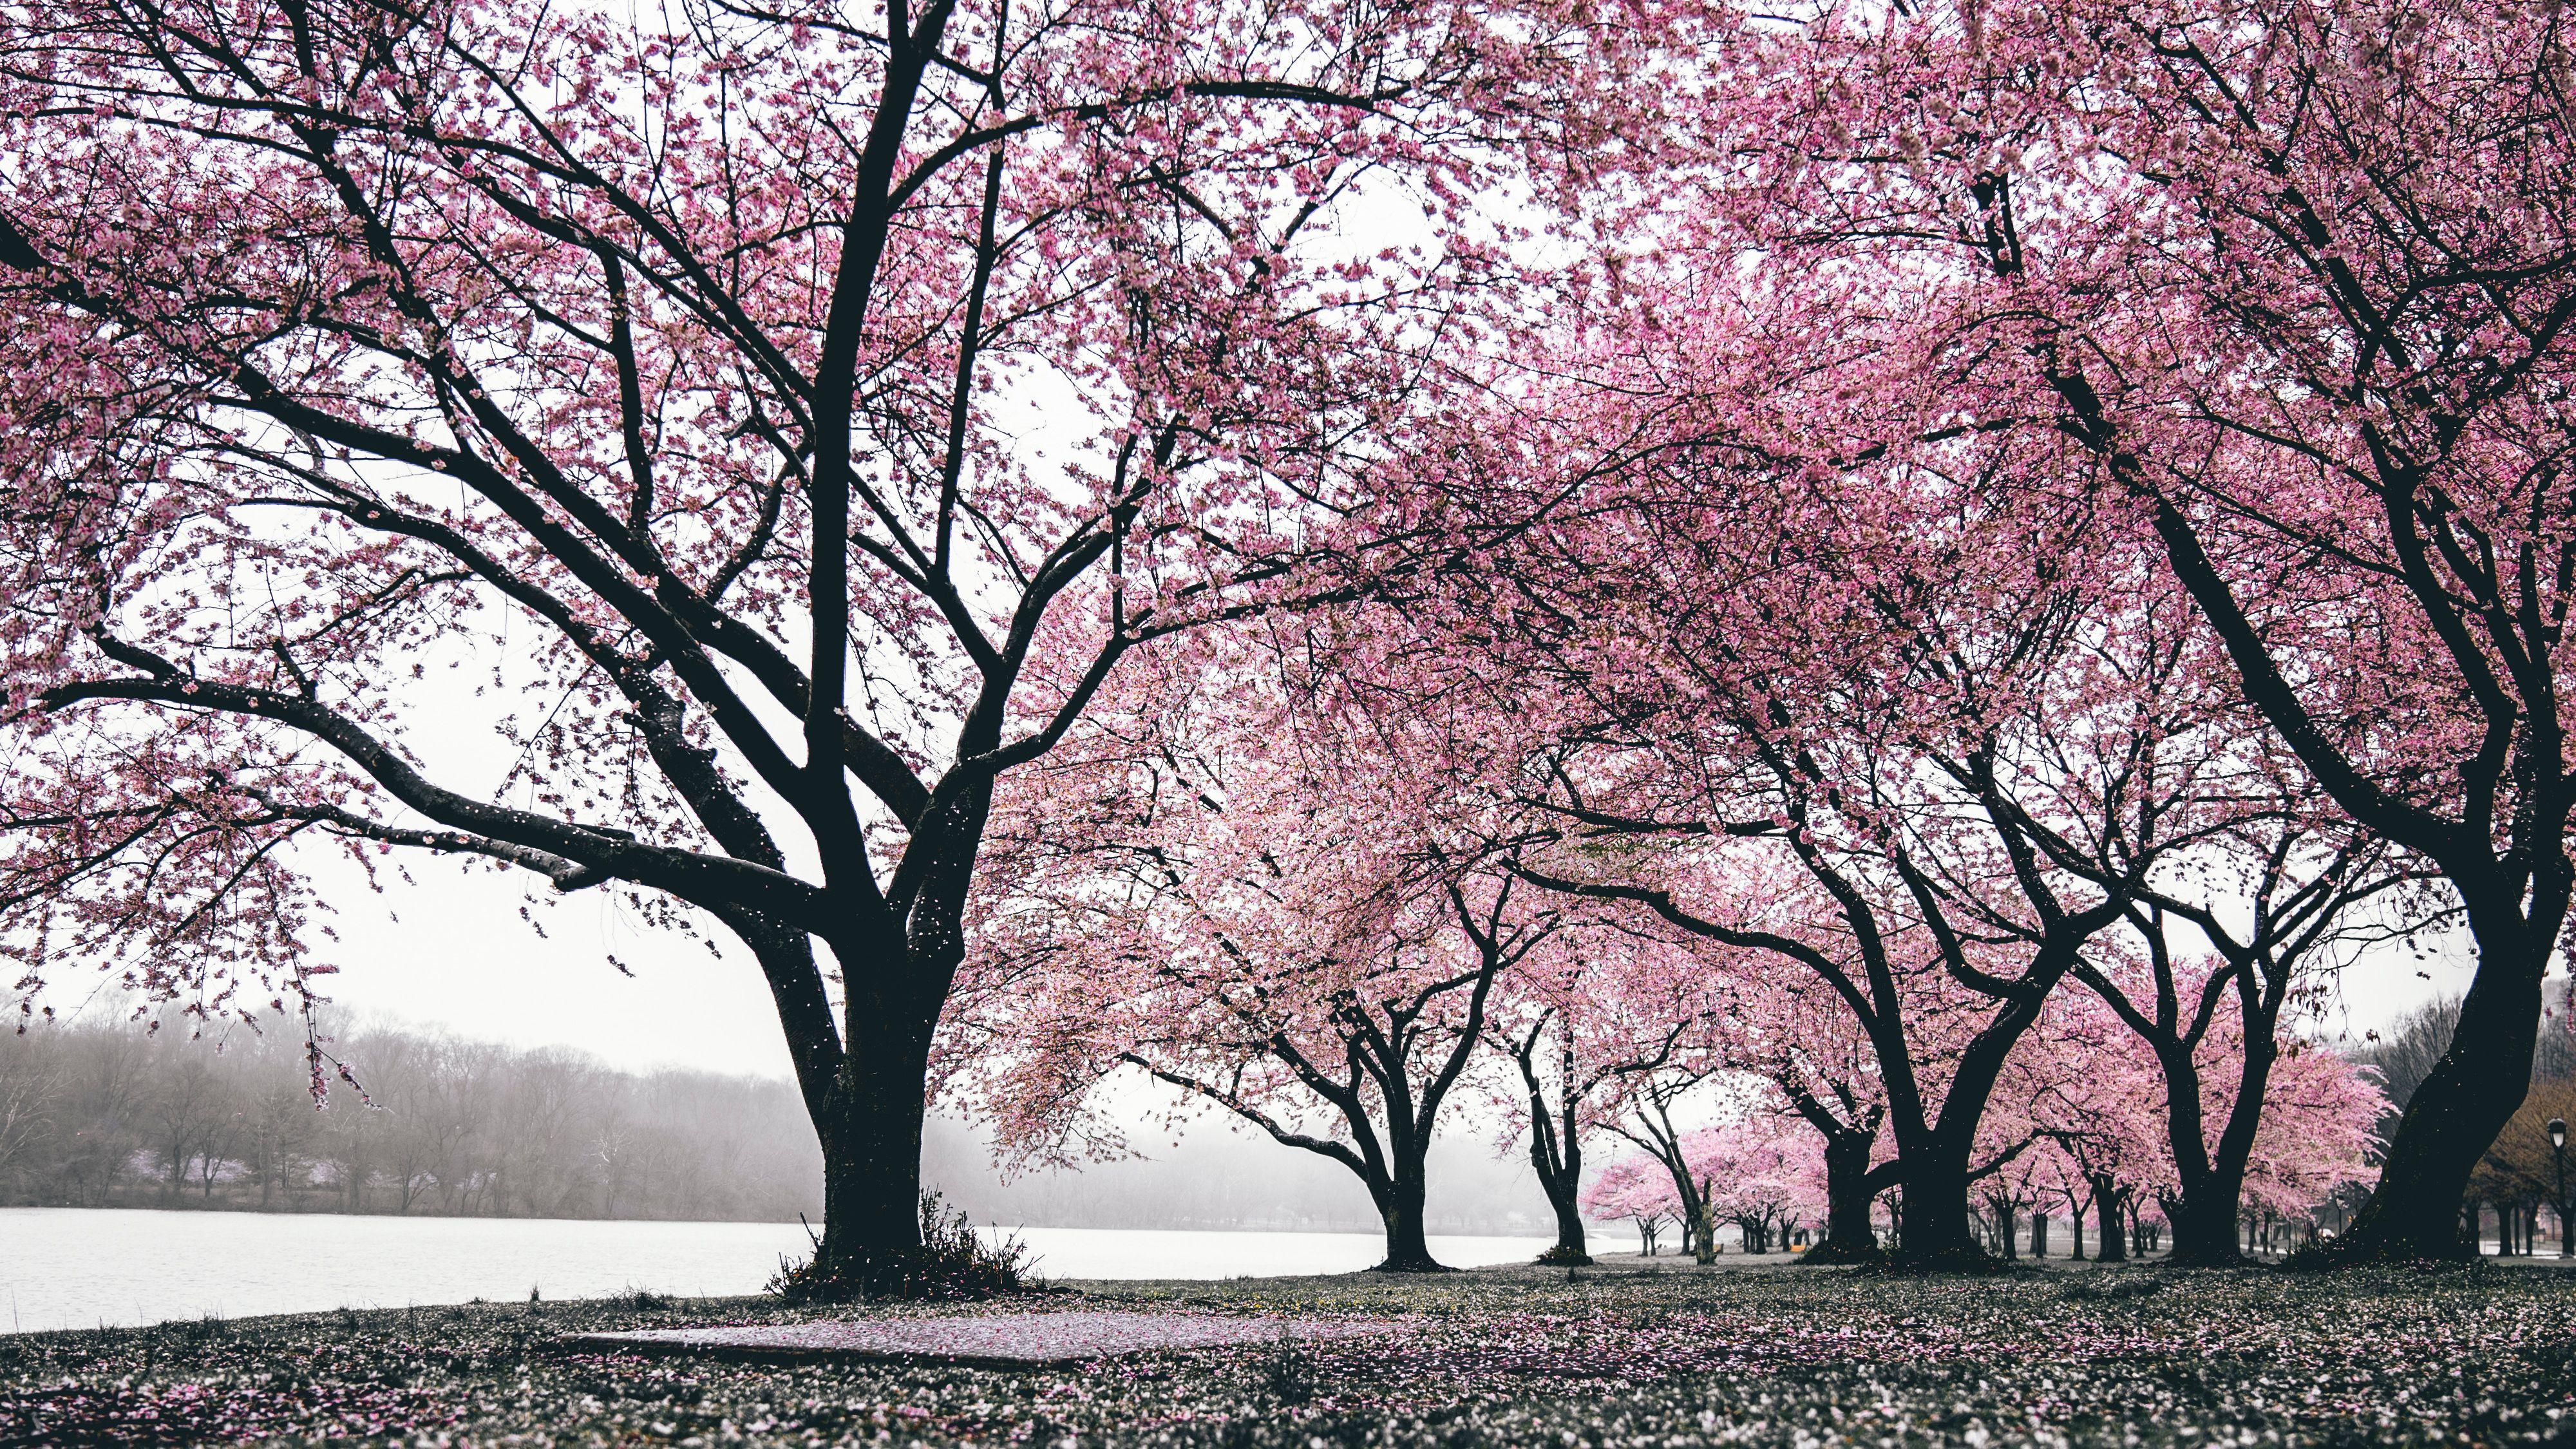 Wallpapers Flower Pink Cherry Blossom Sakura Haruno Spring Sakura Wallpapers Volcano Wallpaper Cherry Blossom Wallpaper